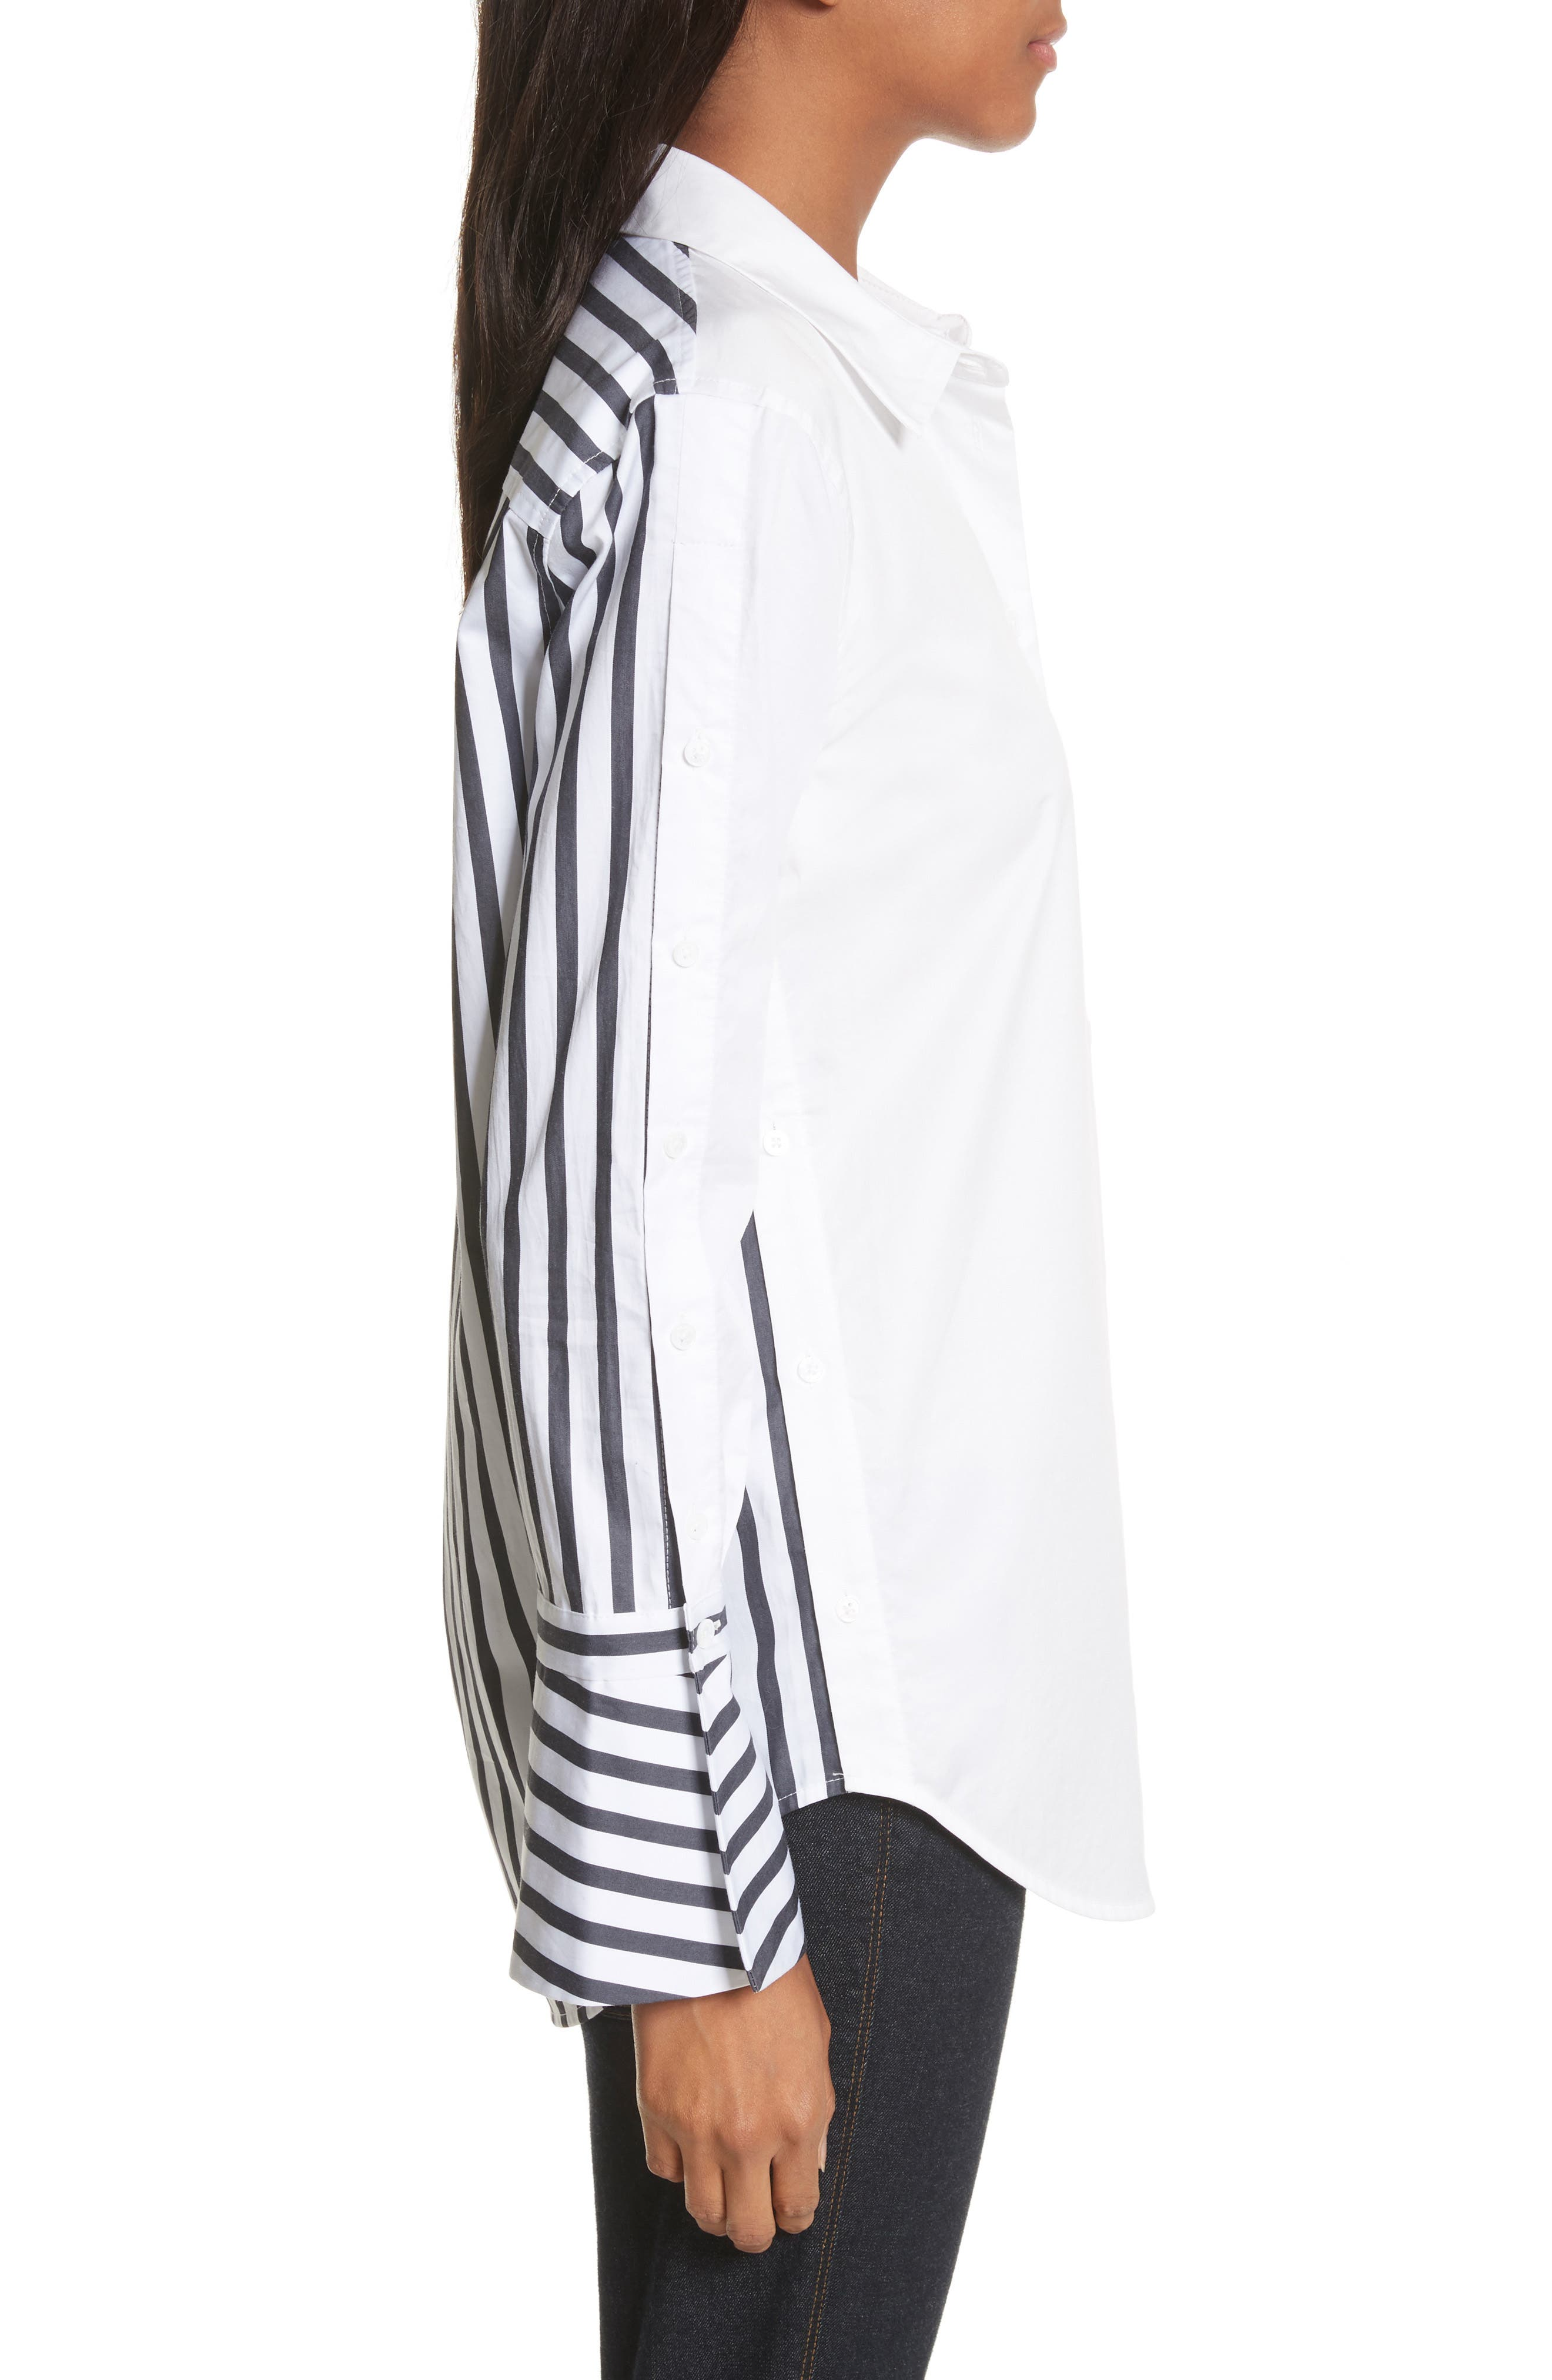 Rossi Contrast Stripe Button Down Shirt,                             Alternate thumbnail 3, color,                             Bright White/ Eclipse